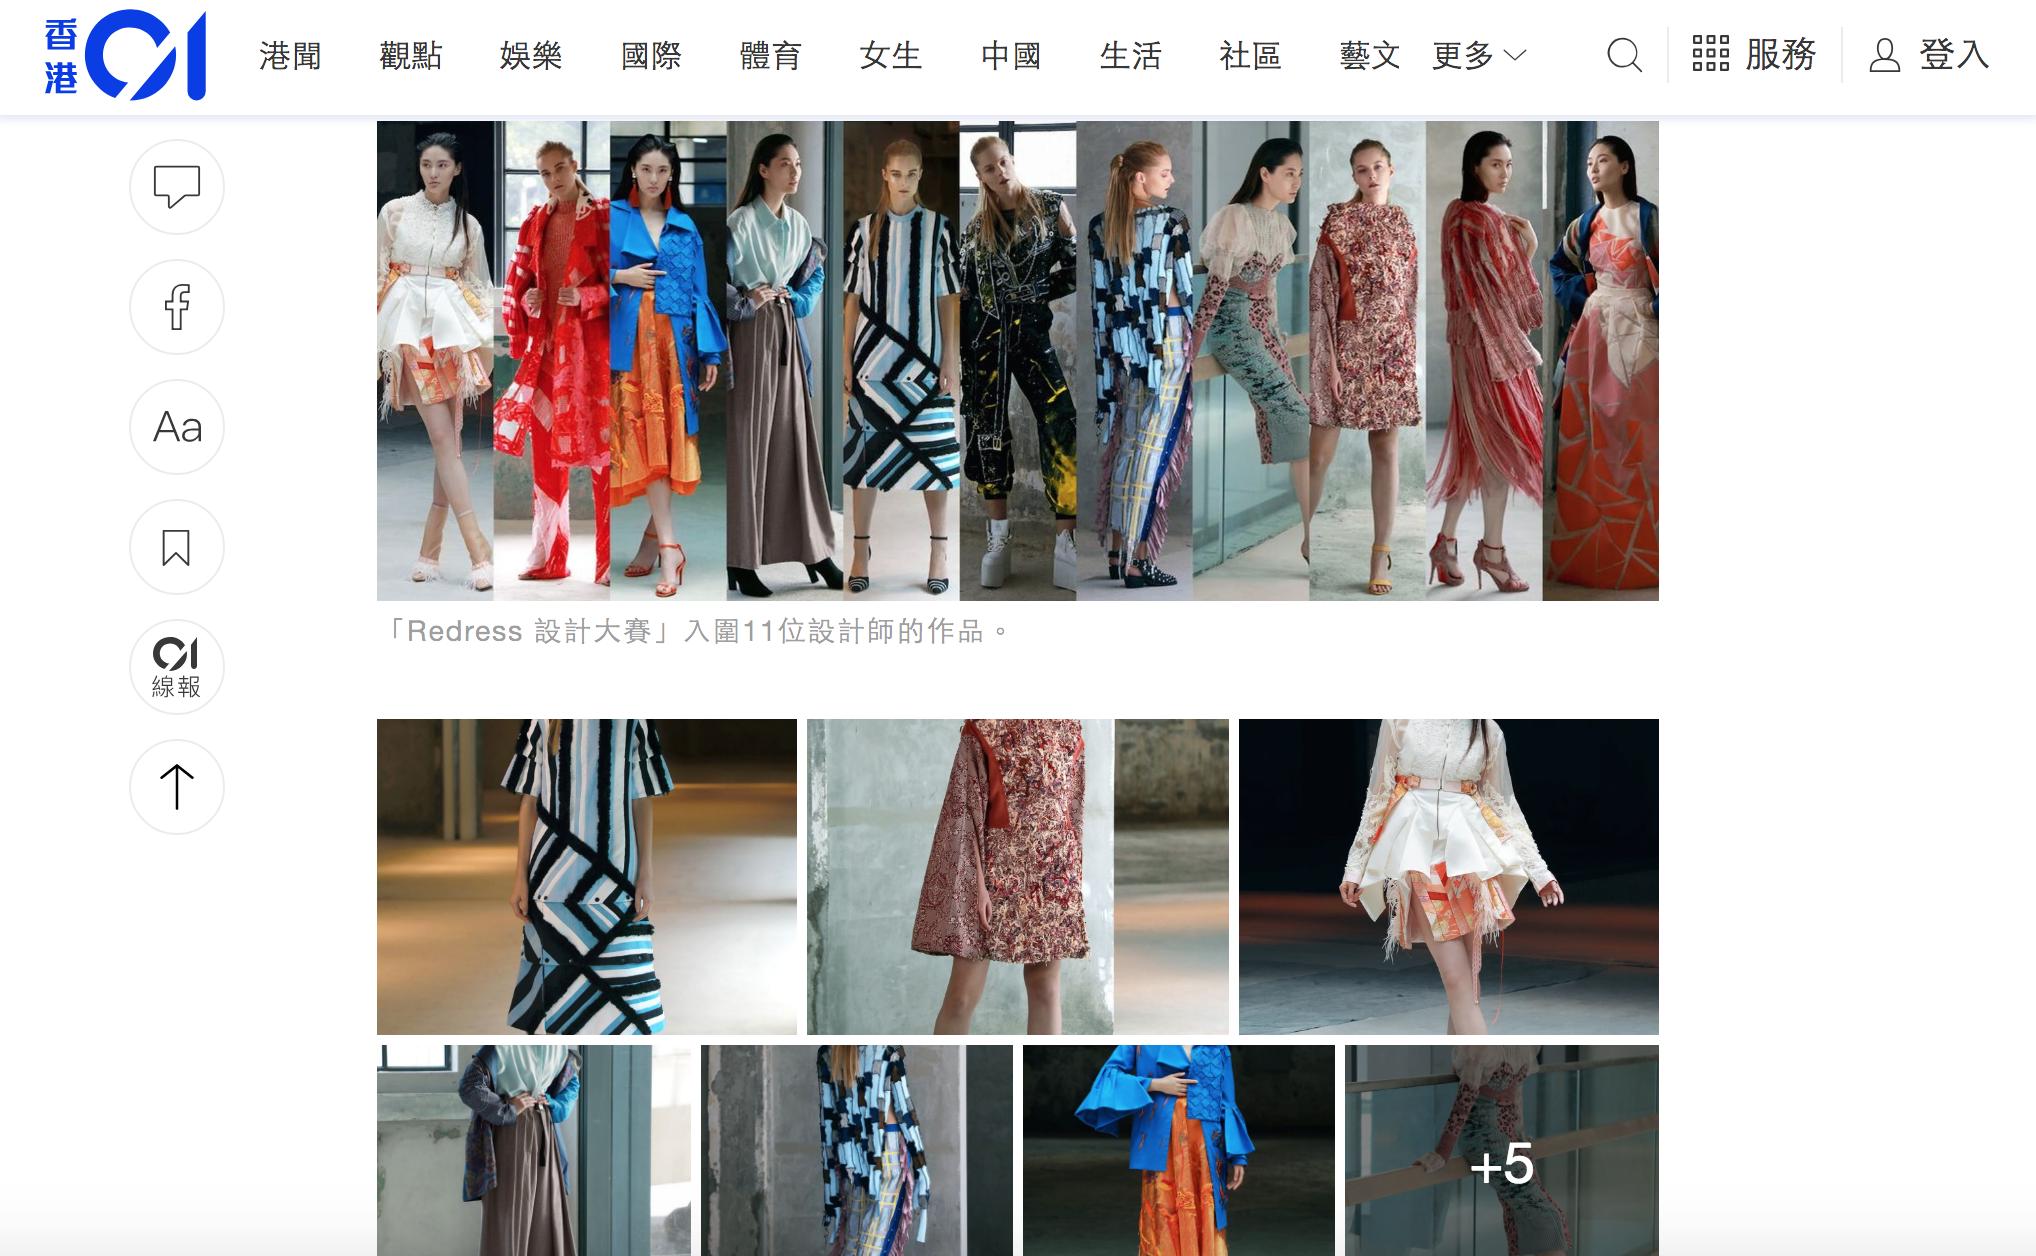 "03, September, 2018 ""11 fashion designers from Redress Design Awards"" from HK01 ( Mandarin version )"